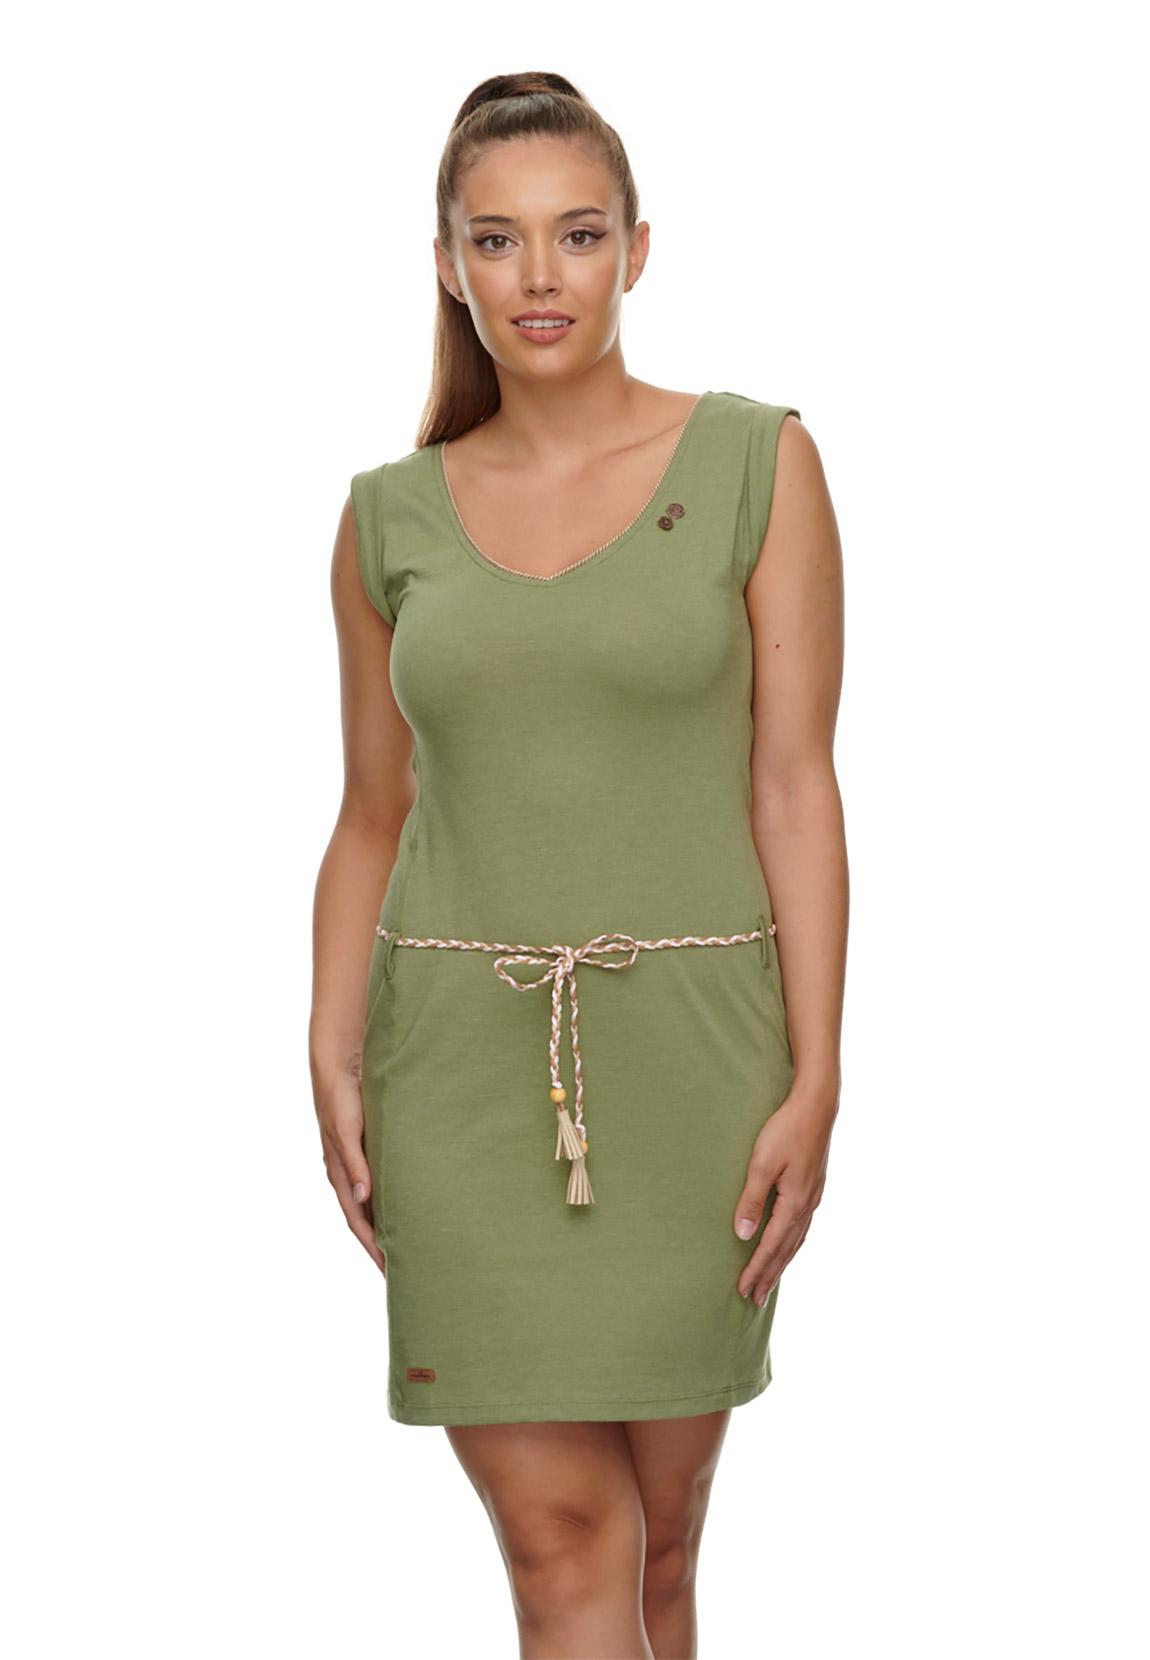 ragwear kleid damen slavka 2111-20022 khaki 5031 ollive | fashioncode.de  onlineshop